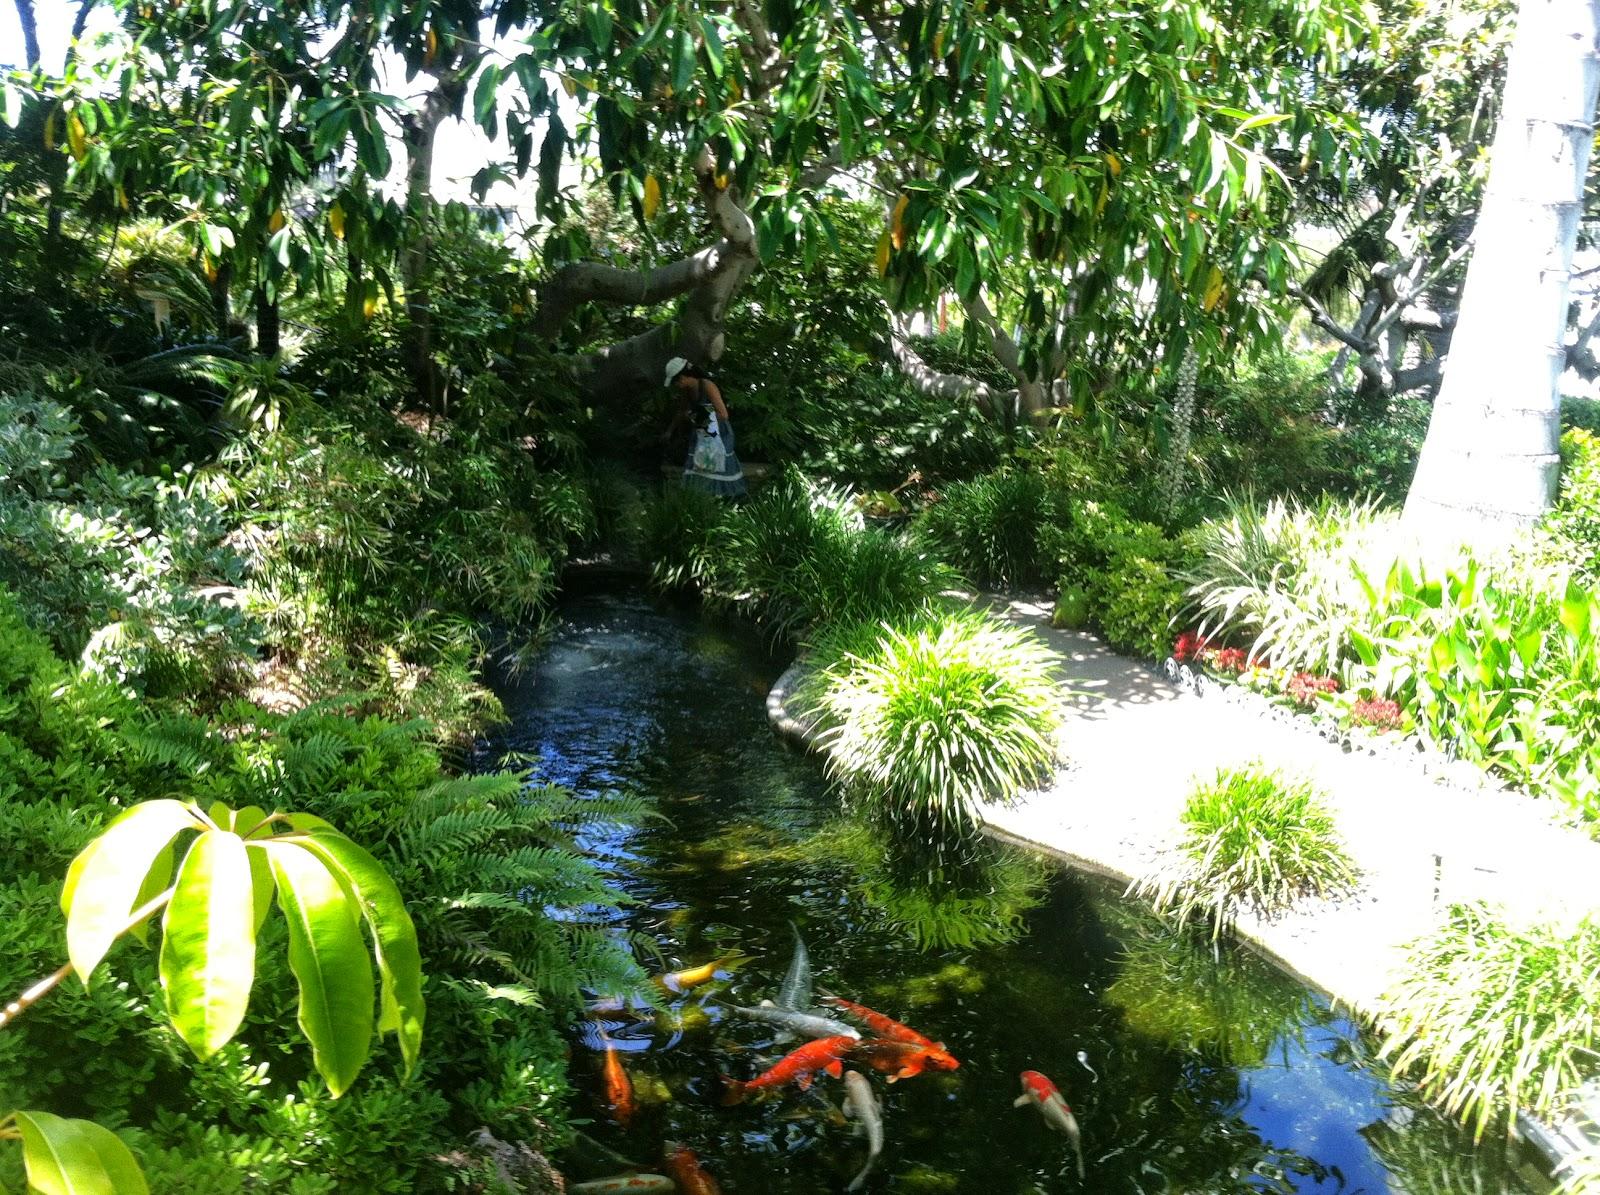 Living California Encinitas Meditation Garden Two Wayward Travlers